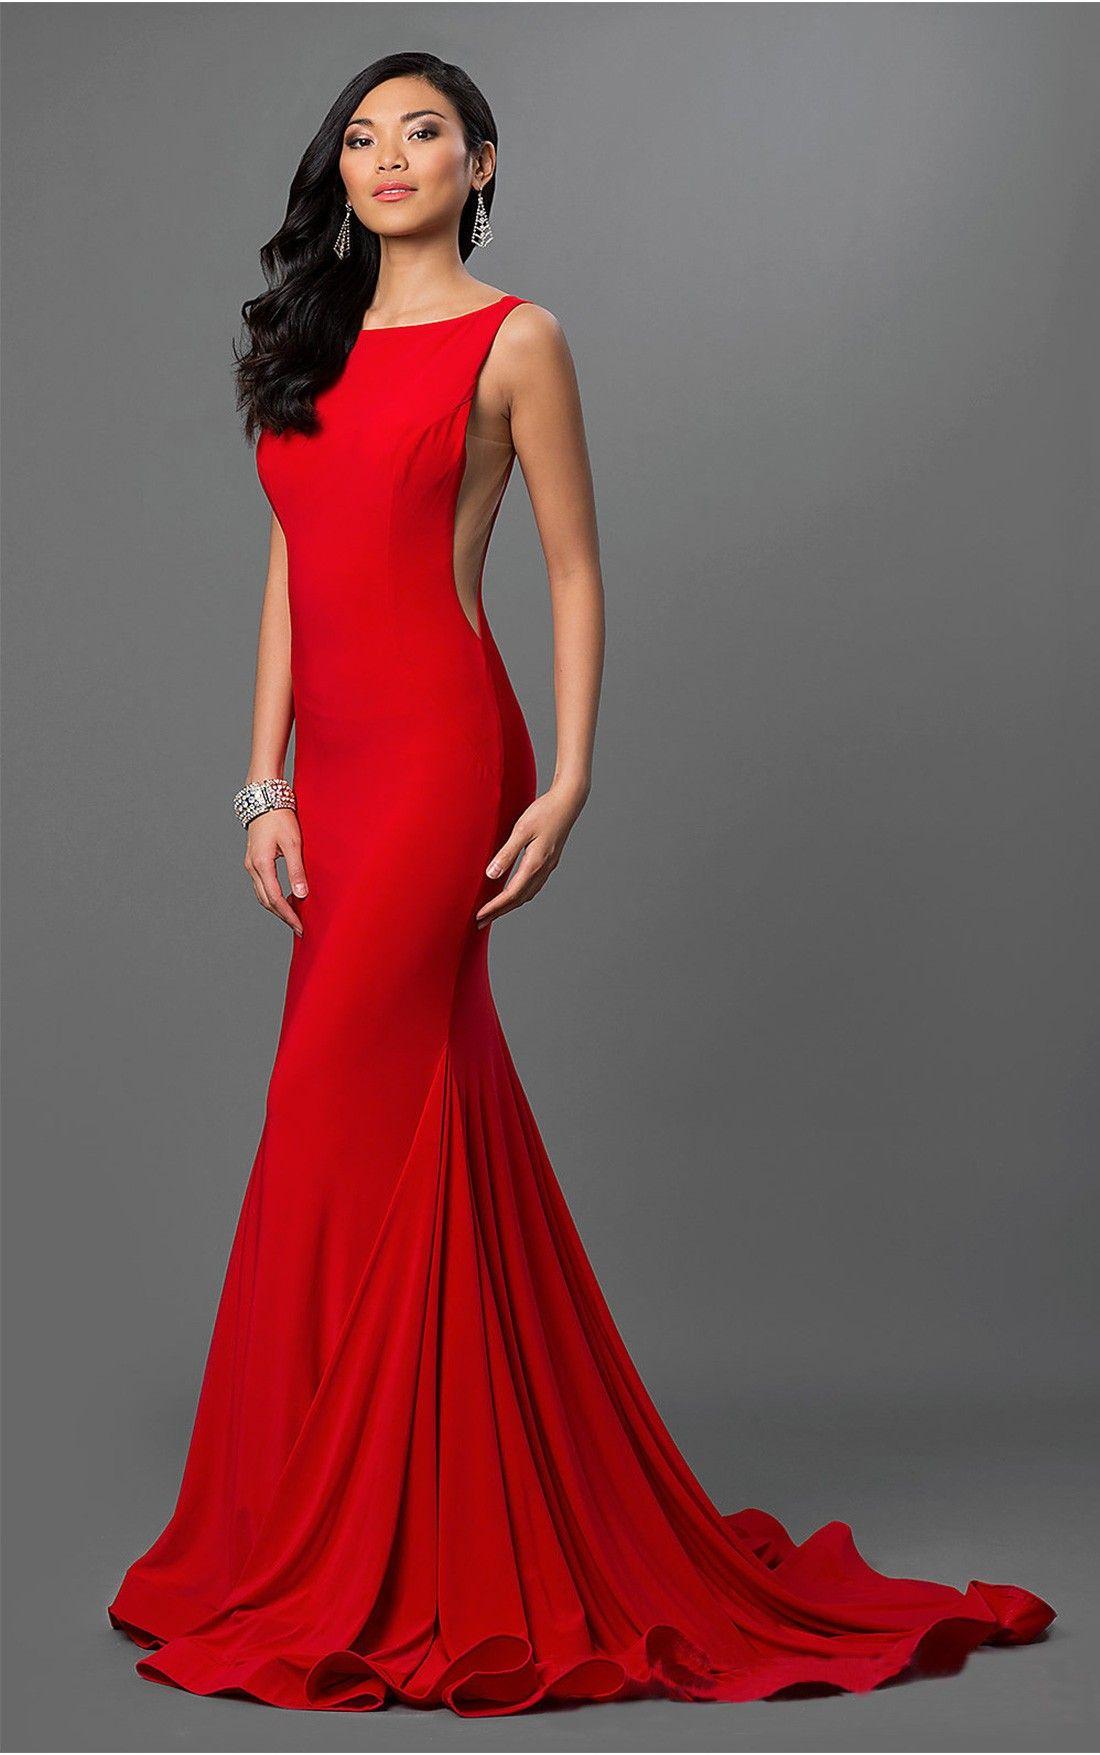 Jovani Low Back Red Jersey Dress | Low back dresses | Pinterest ...